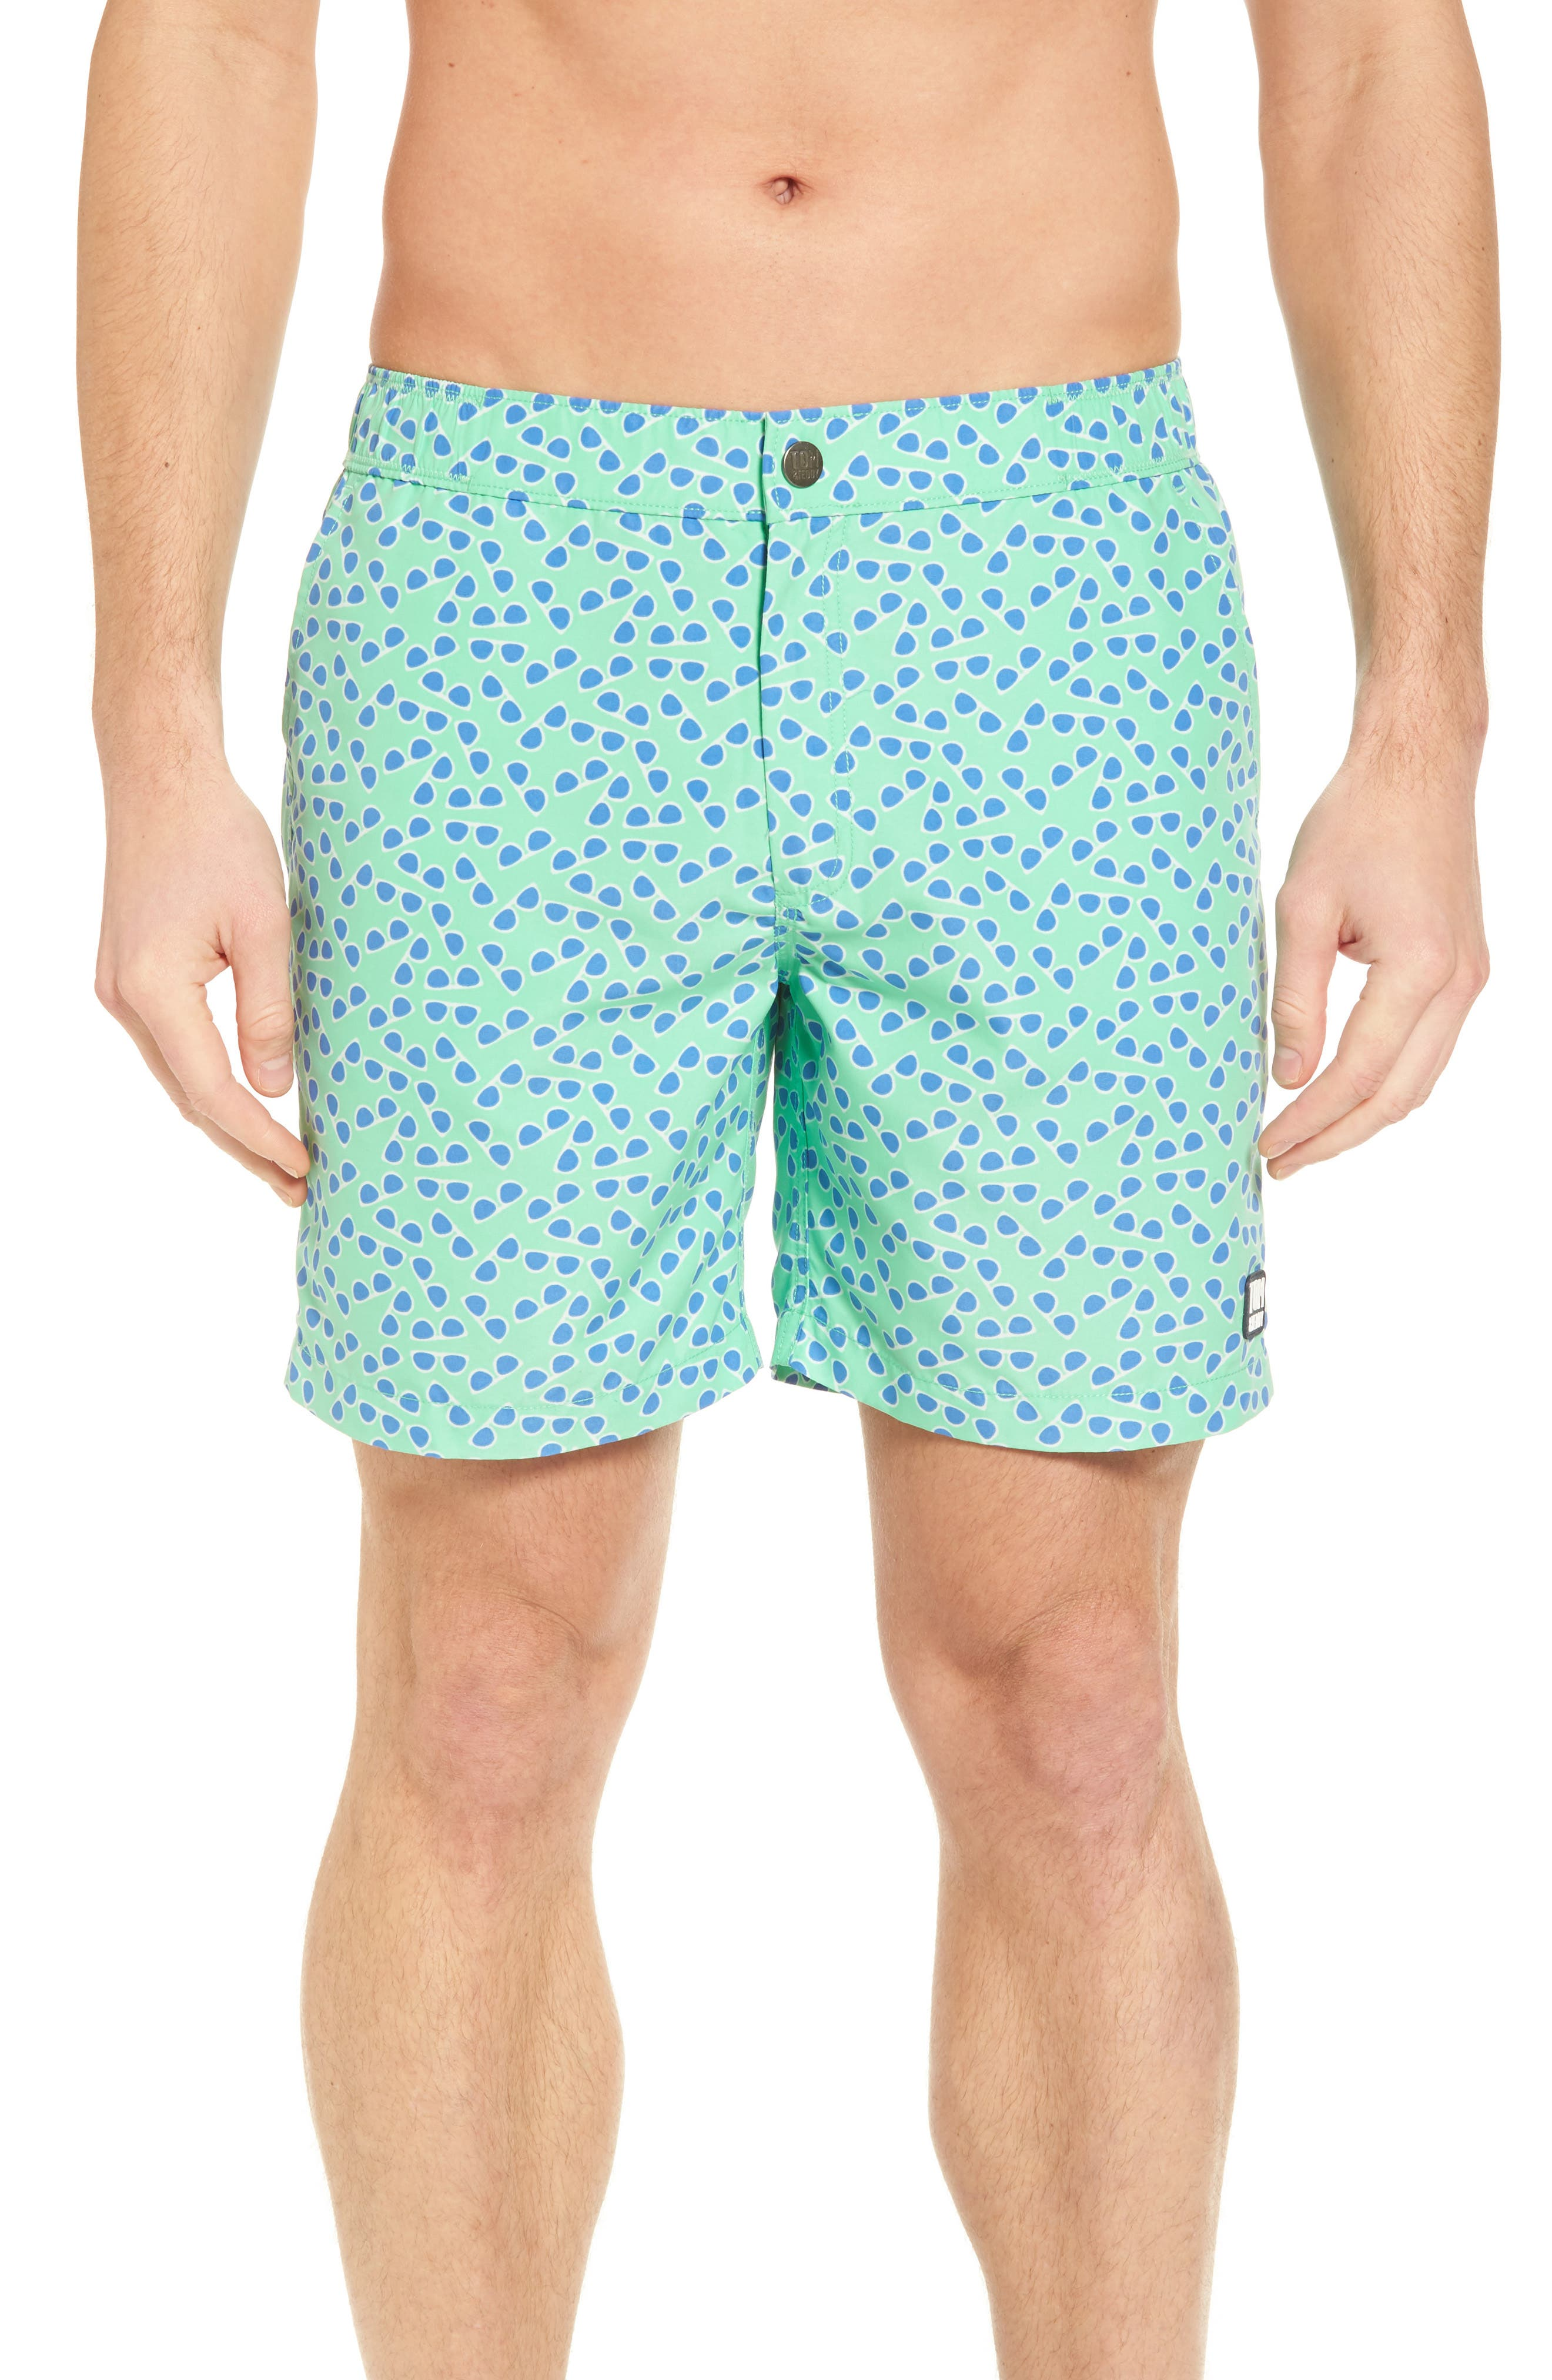 Sunglasses Print Swim Trunks,                             Main thumbnail 1, color,                             Spring Green